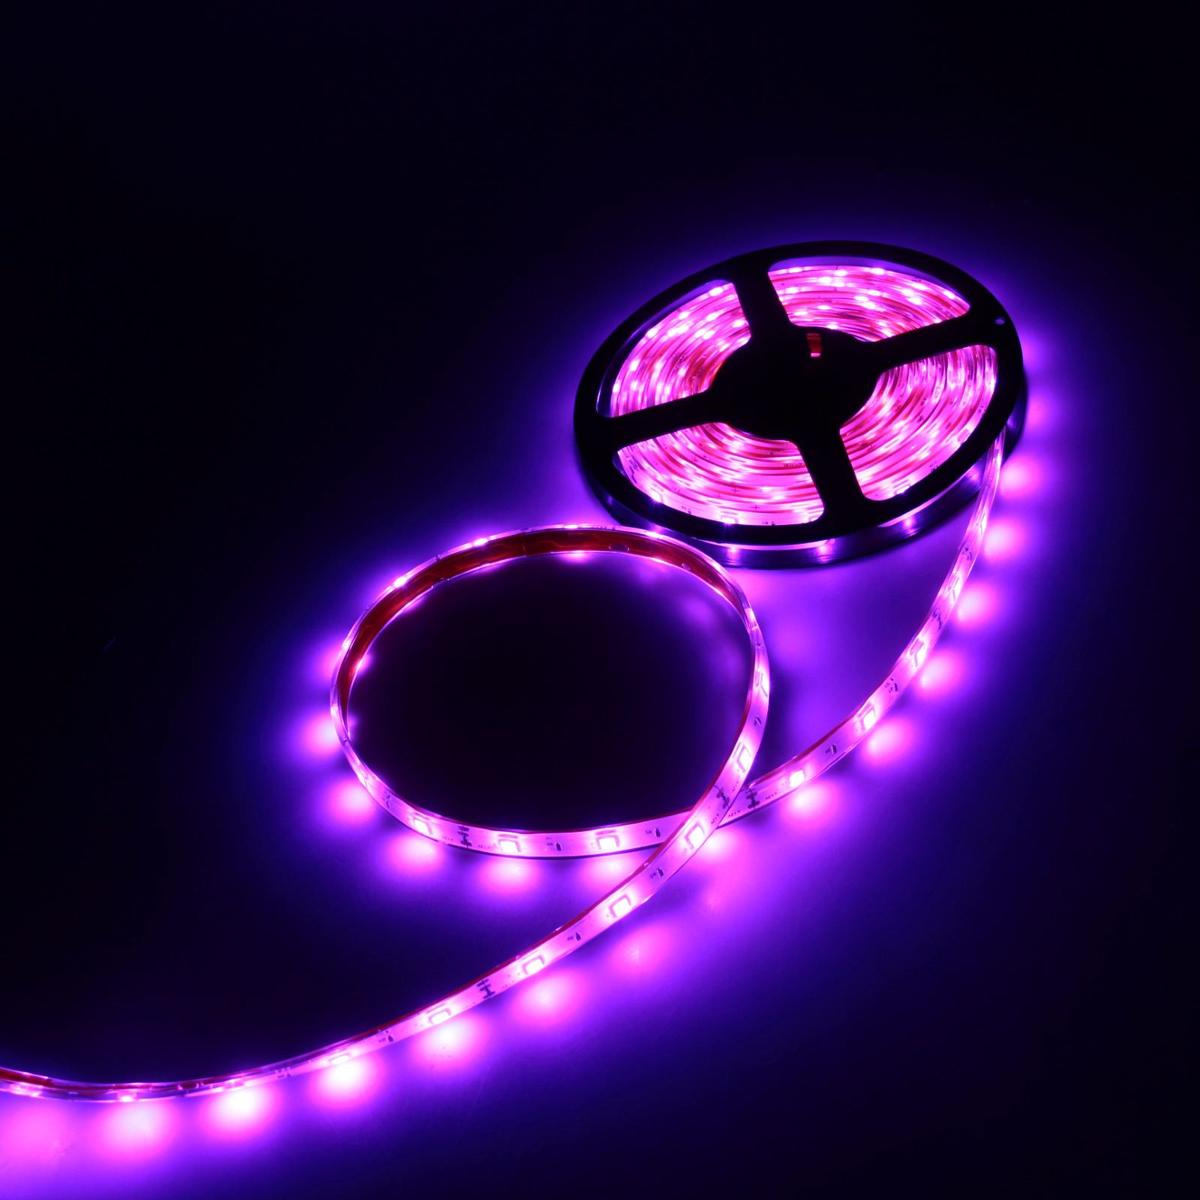 Светодиодная лента Luazon, 12В, SMD5050, длина 5 м, IP68, 30 LED ламп, 7.2 Вт/м, 14-16 Лм/1 LED, DC, цвет: фиолетовый светодиодная лента luazon 12в smd3528 длина 5 м ip68 60 led ламп 4 8 вт м 6 7 лм 1 led dc цвет фиолетовый